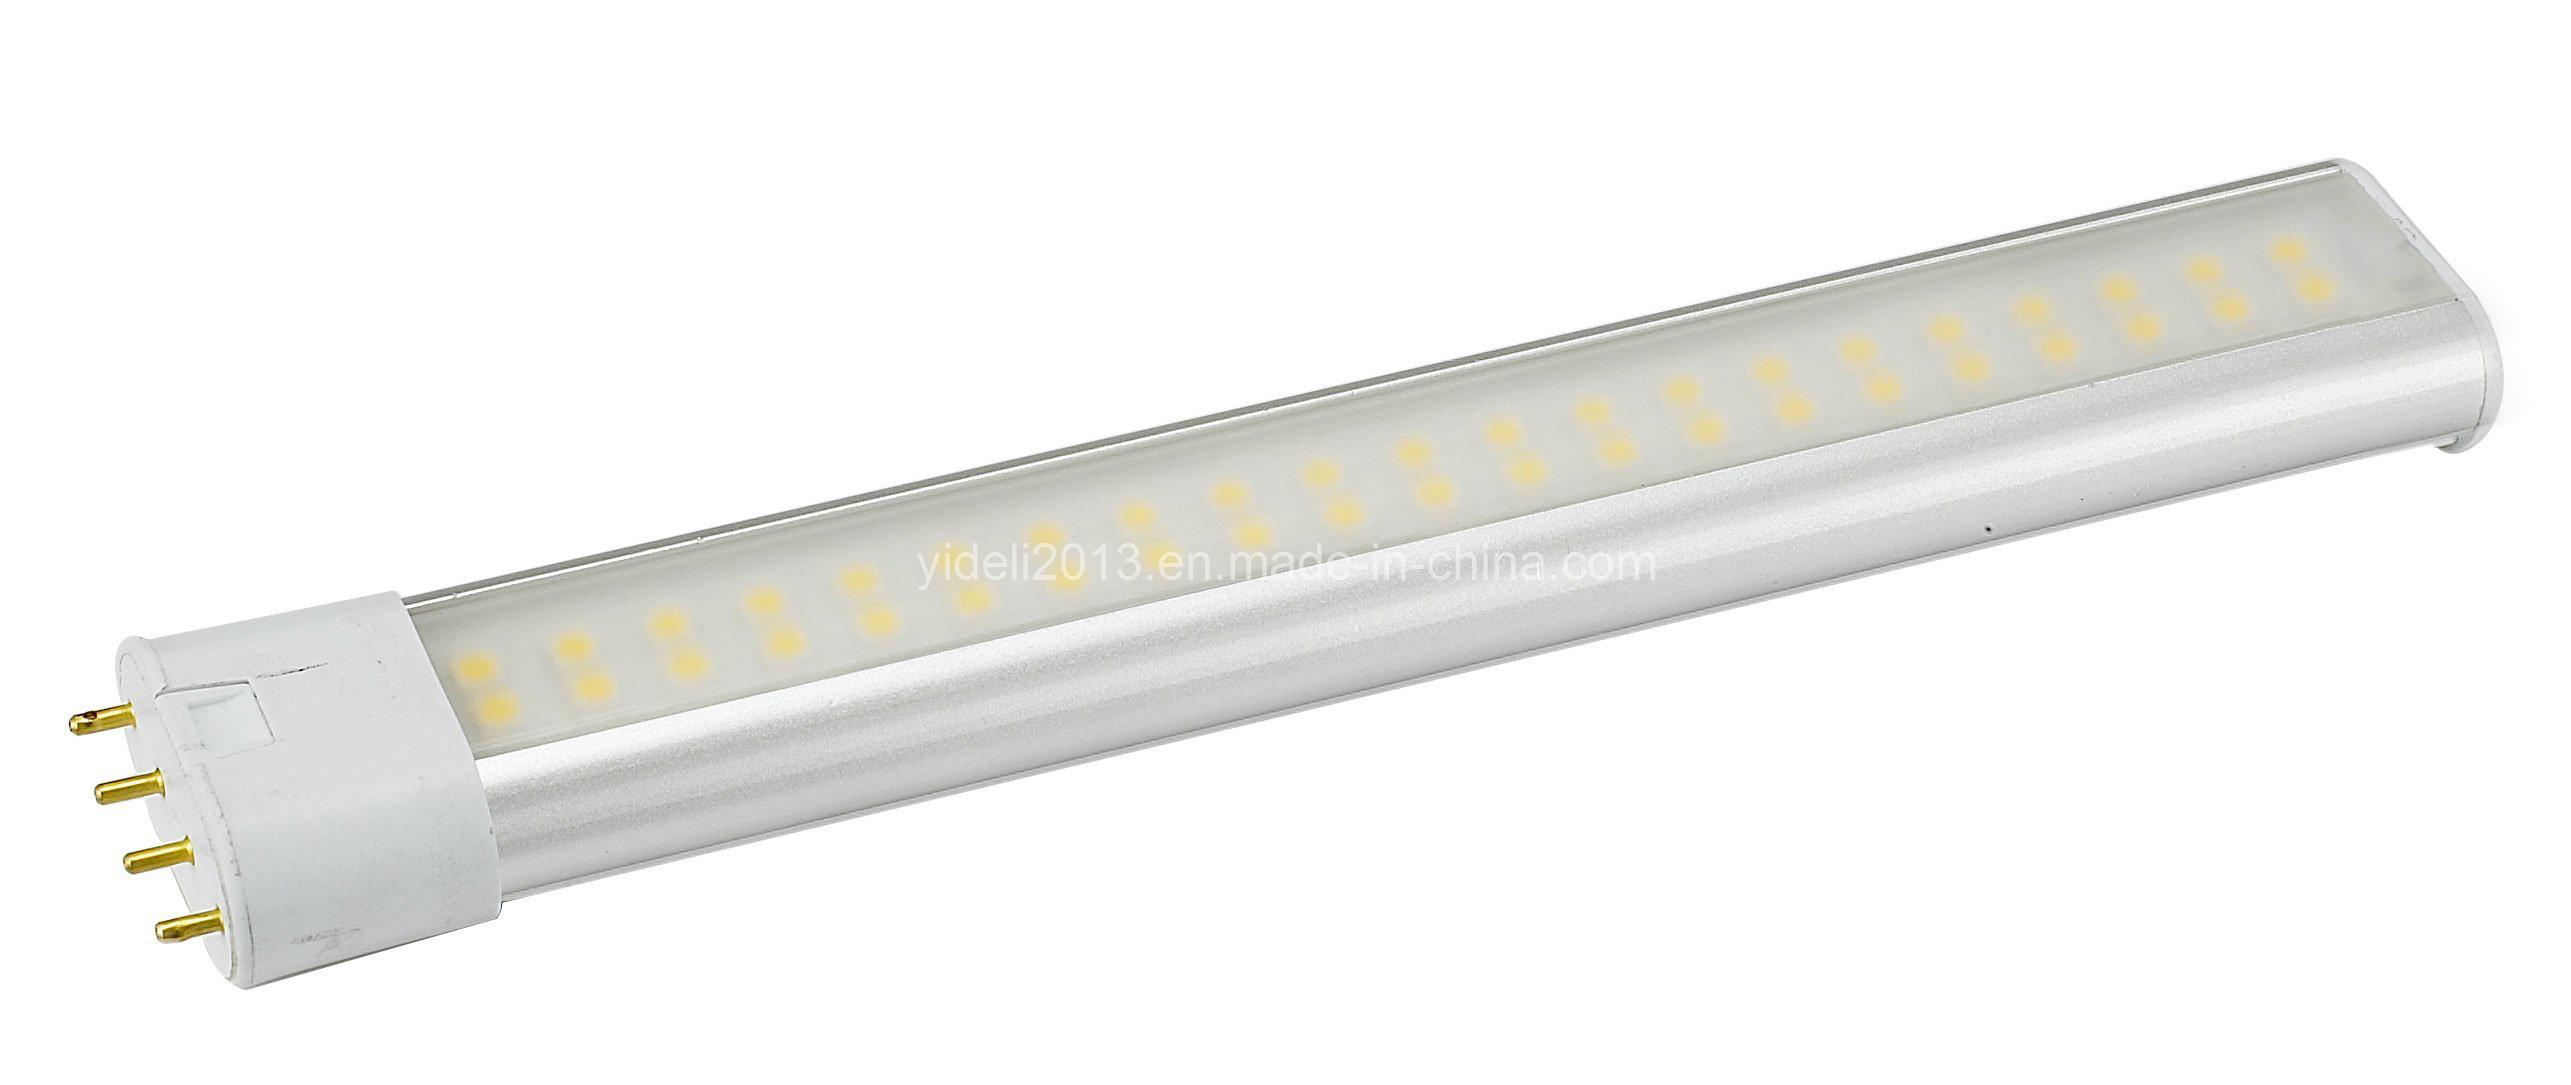 10W LED Pl Tube Light L217mm with External Driver